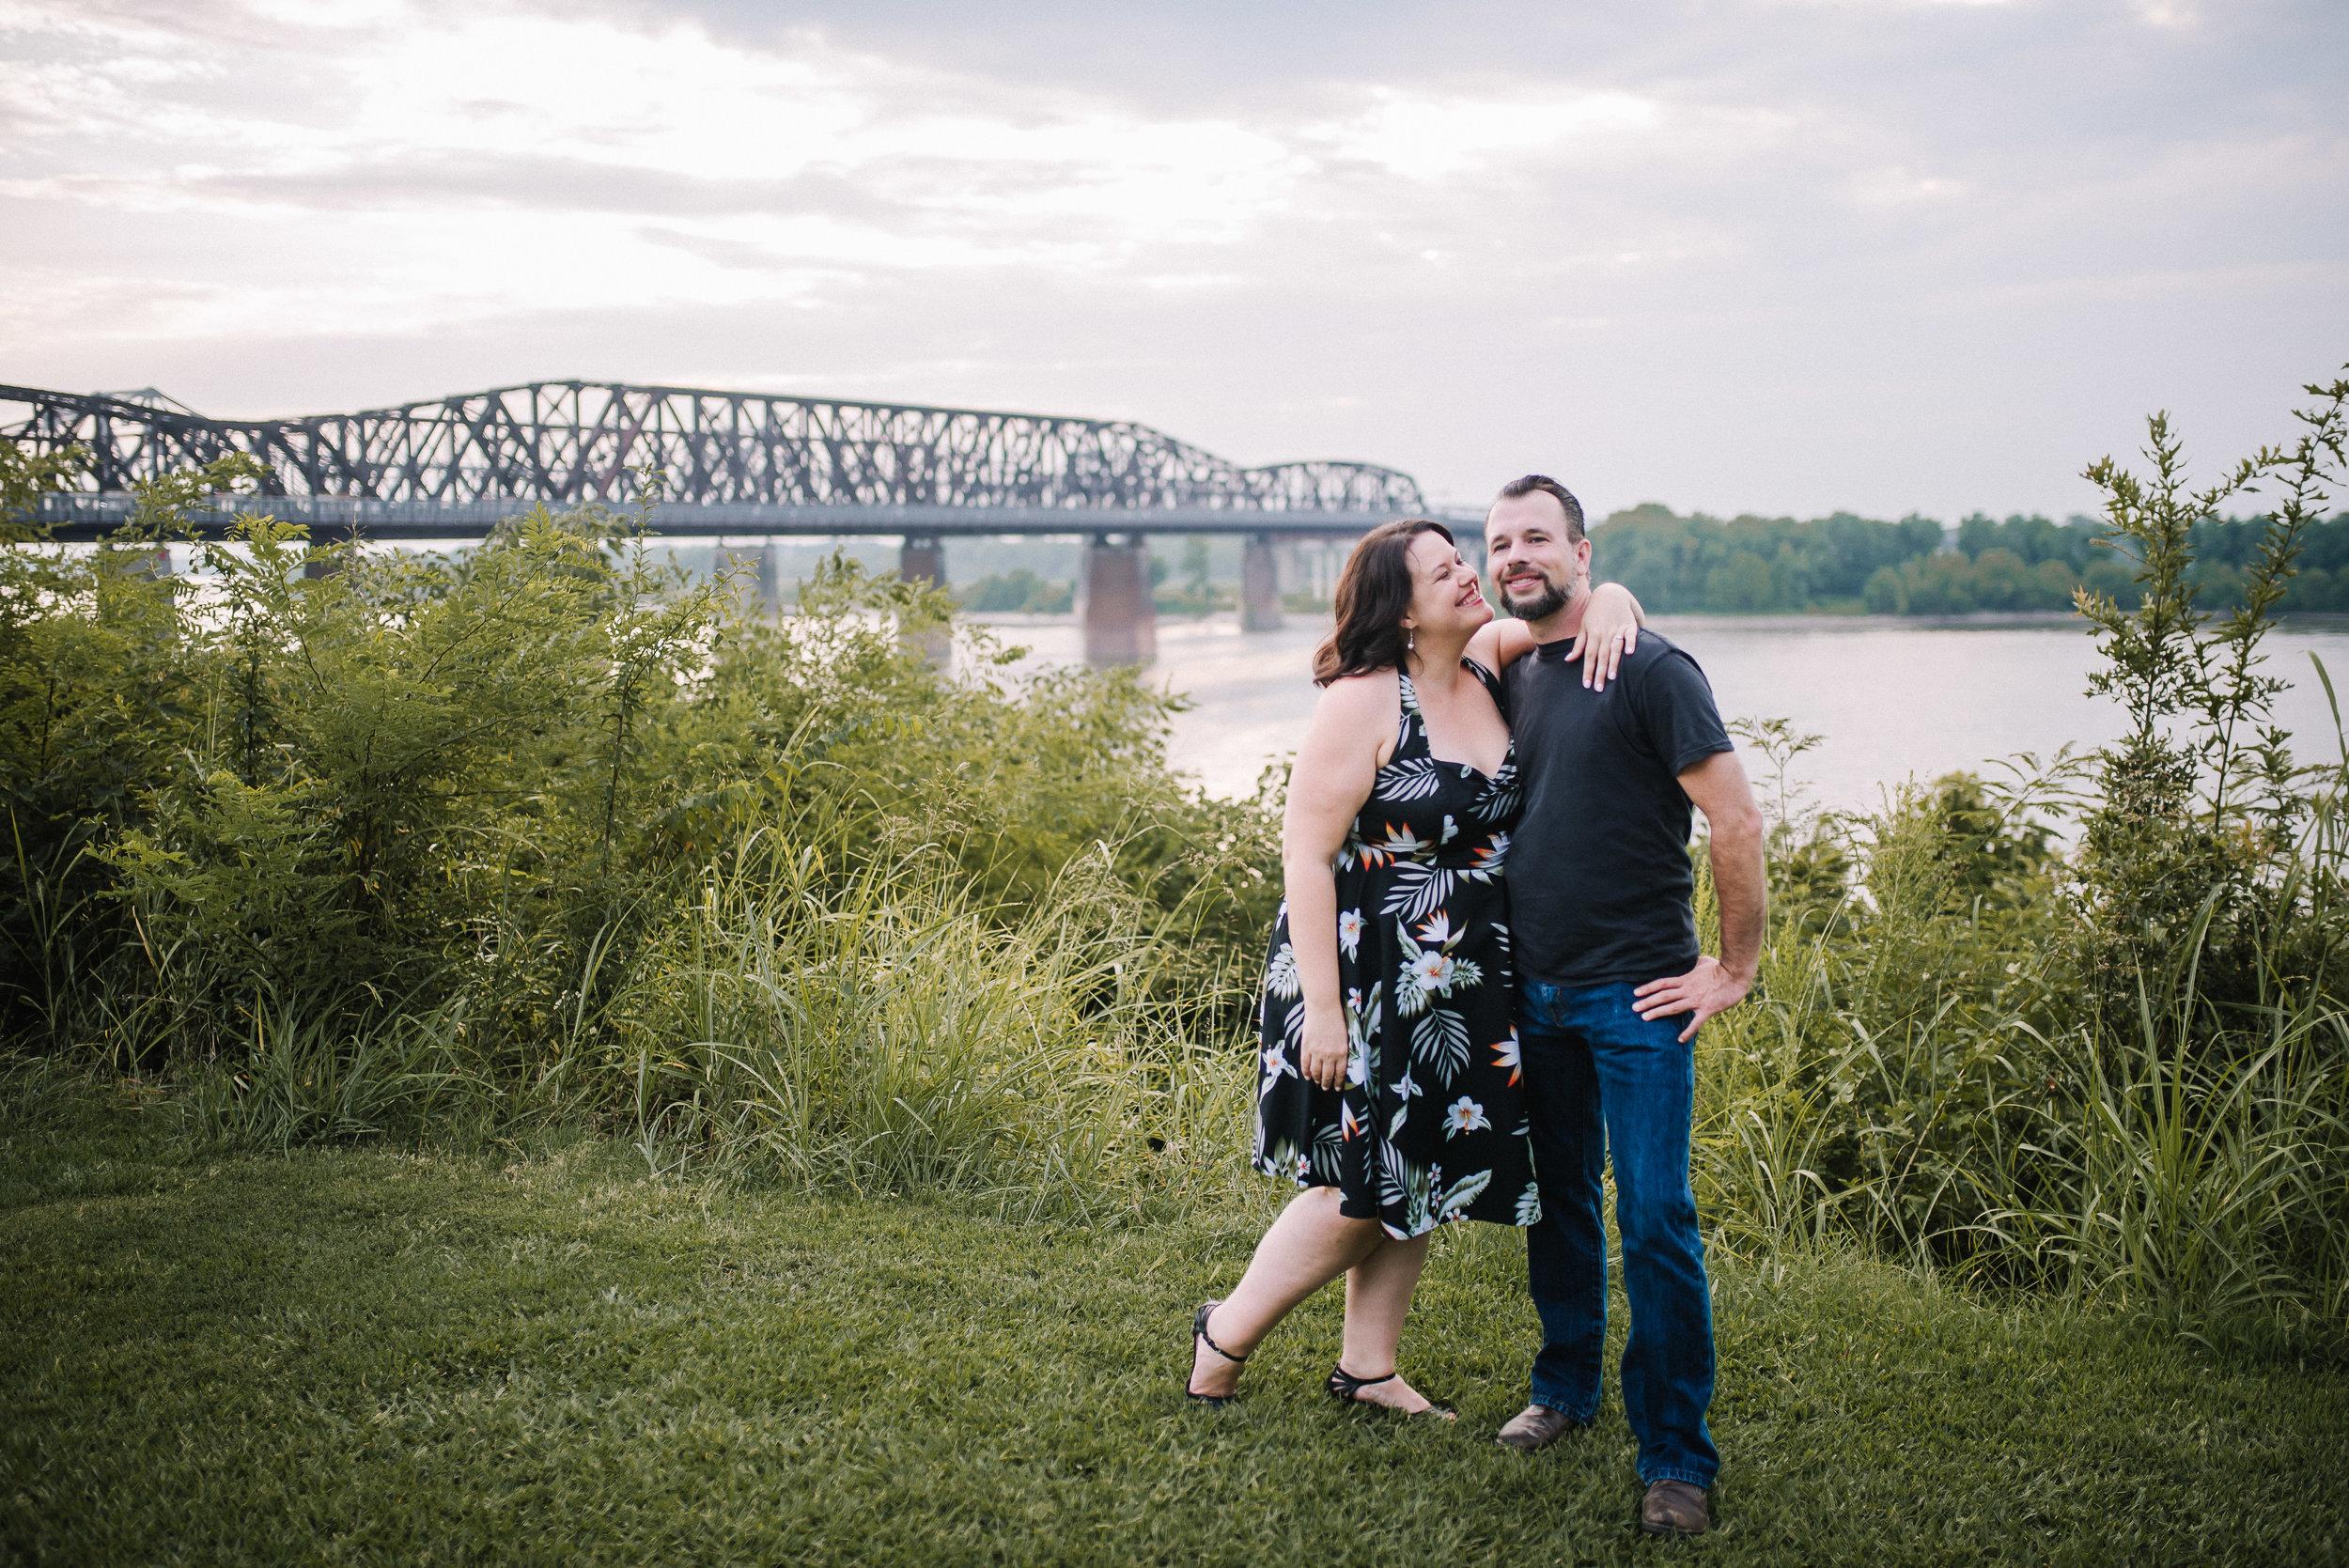 Megan & Steve_Broad Ave Engagement_Ashley Benham Photography-56.jpg